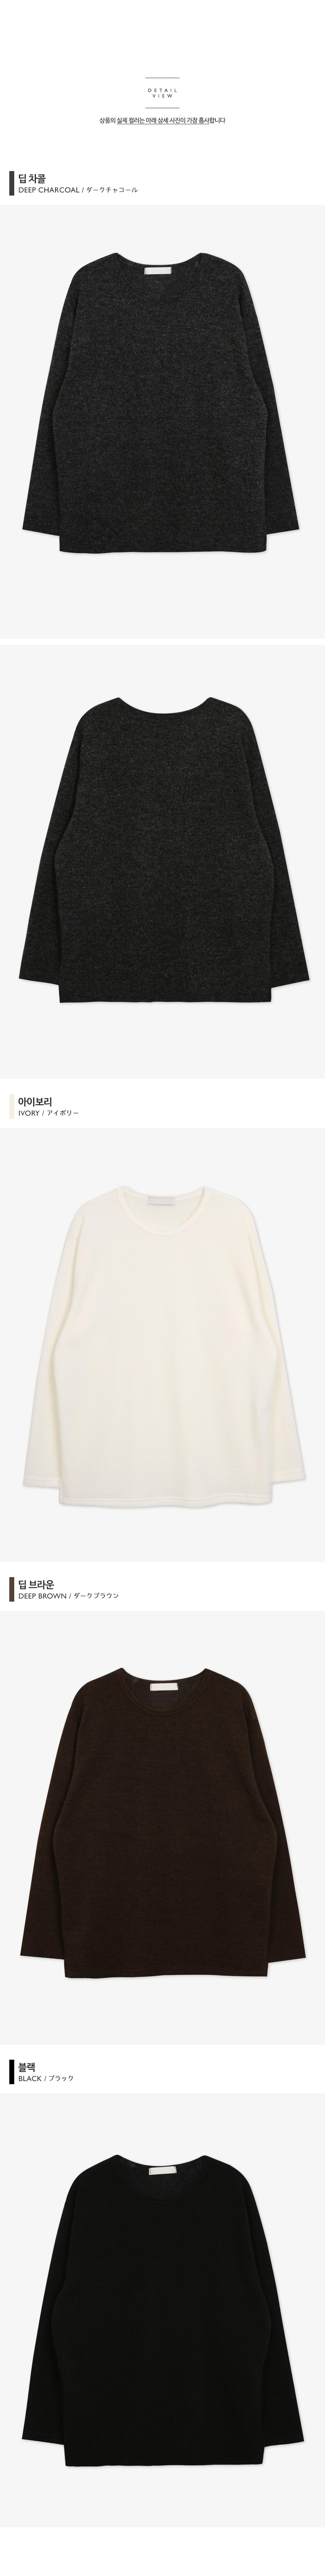 Hairy Wool Knit T-shirt